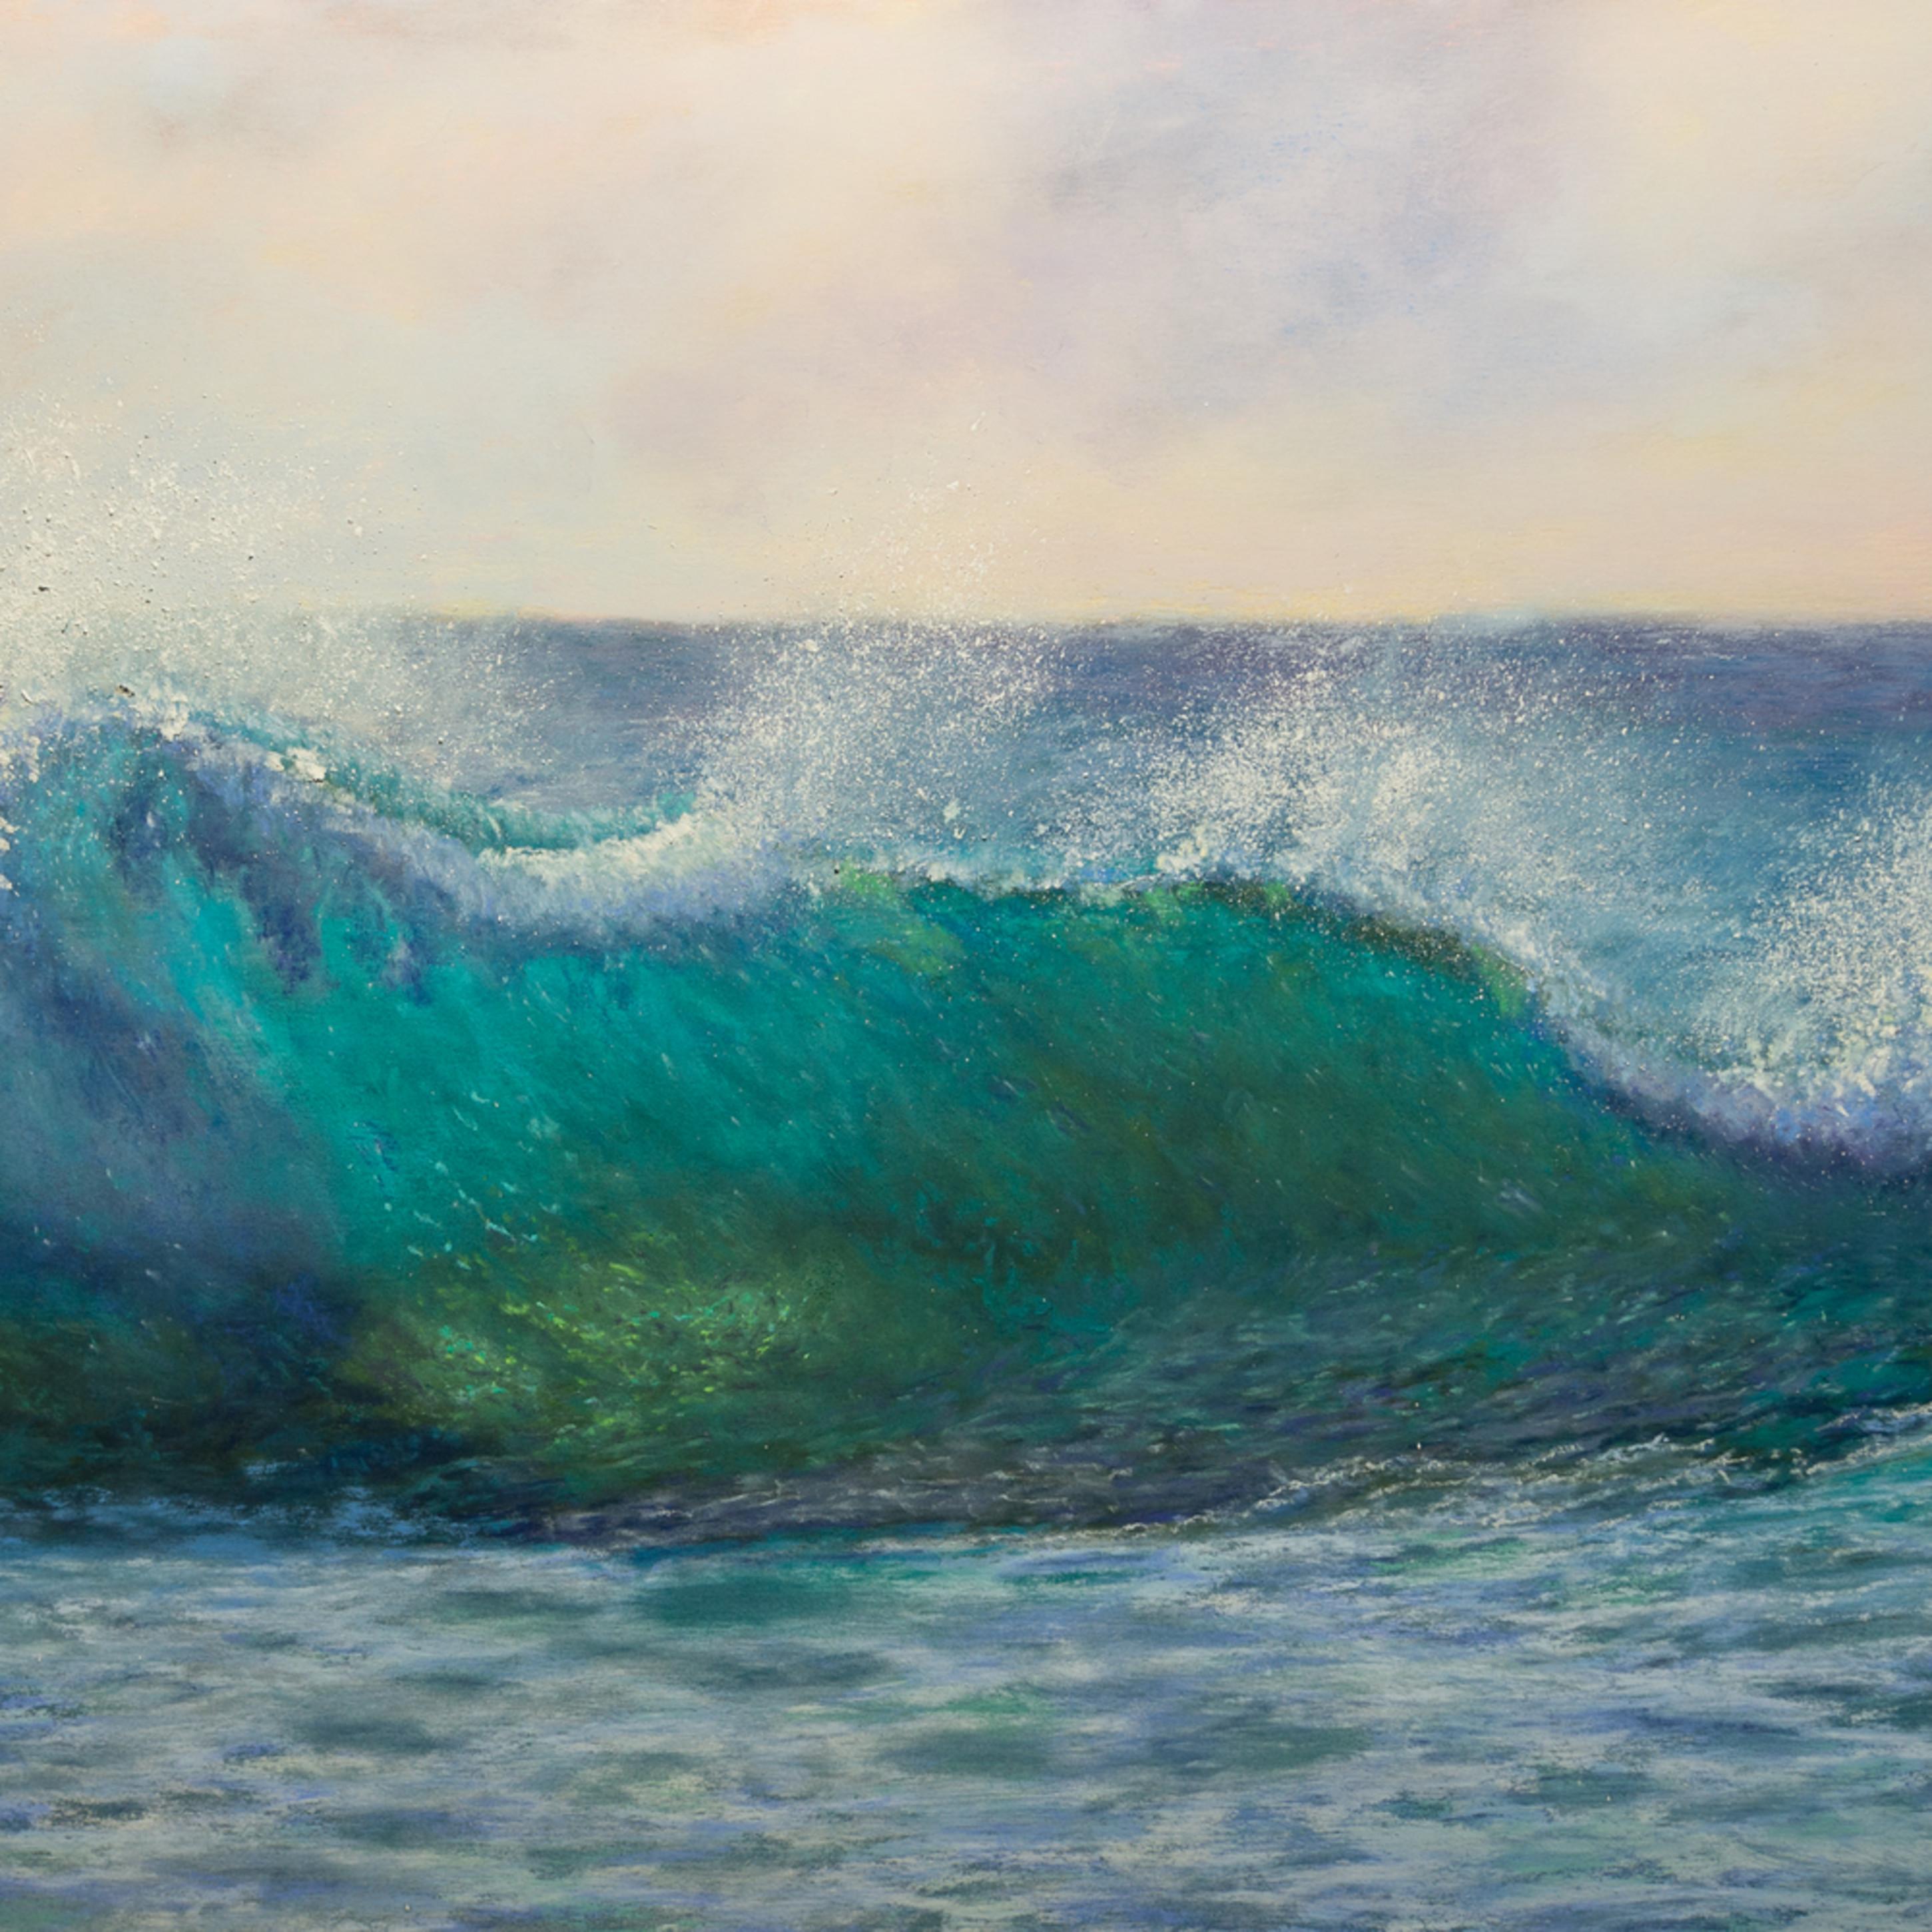 Turquoise morning surf 2 tuno2j